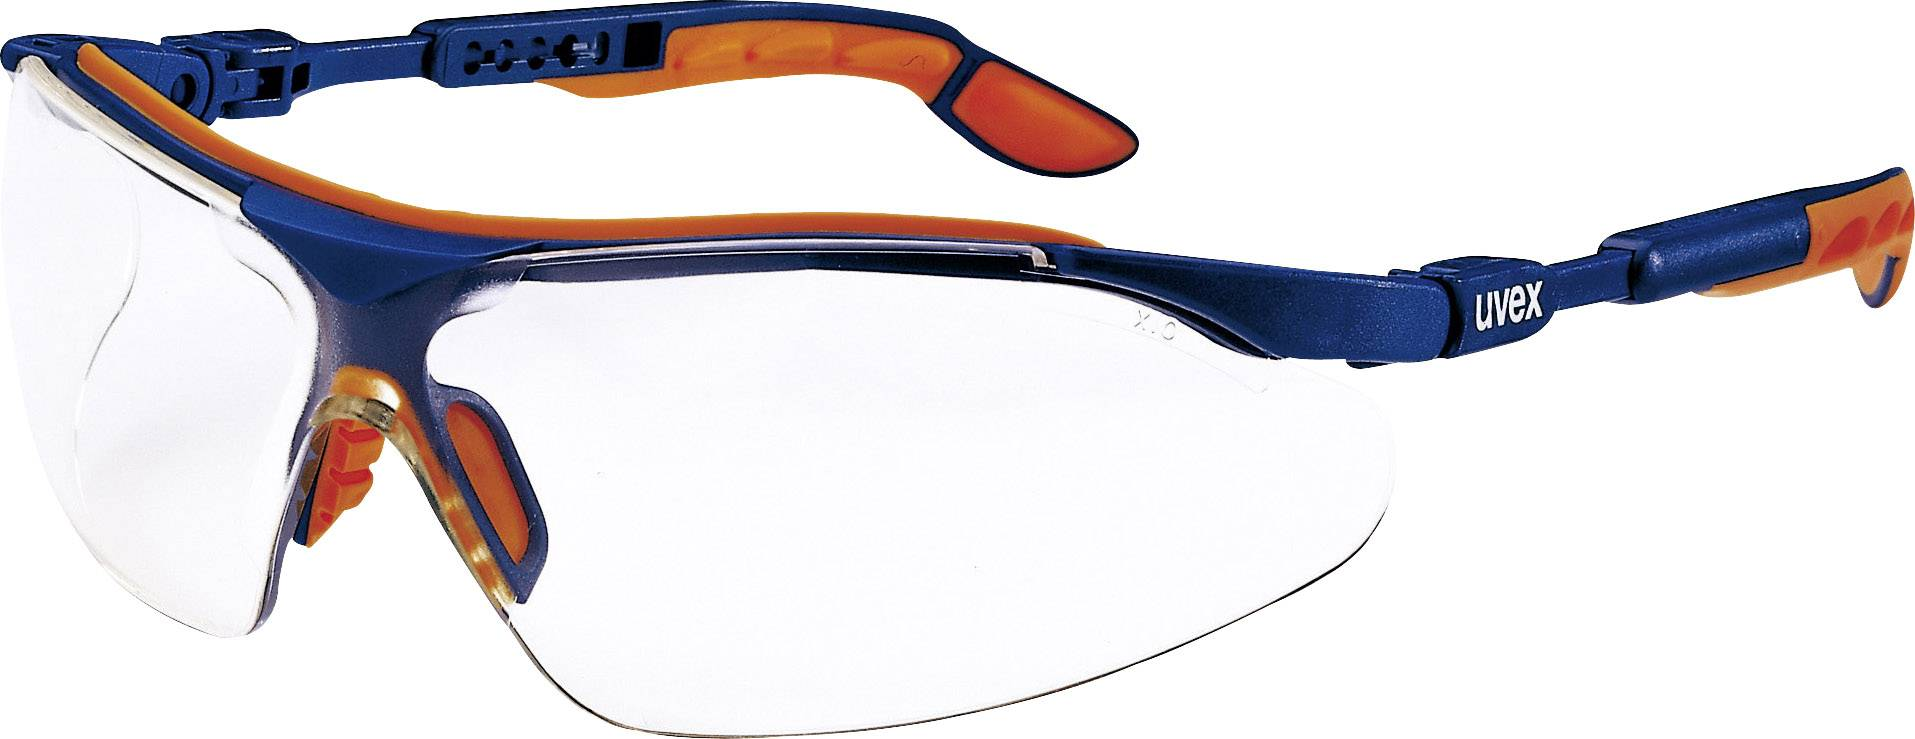 Ochranné brýle Uvex I-VO, 9160265, transparentní